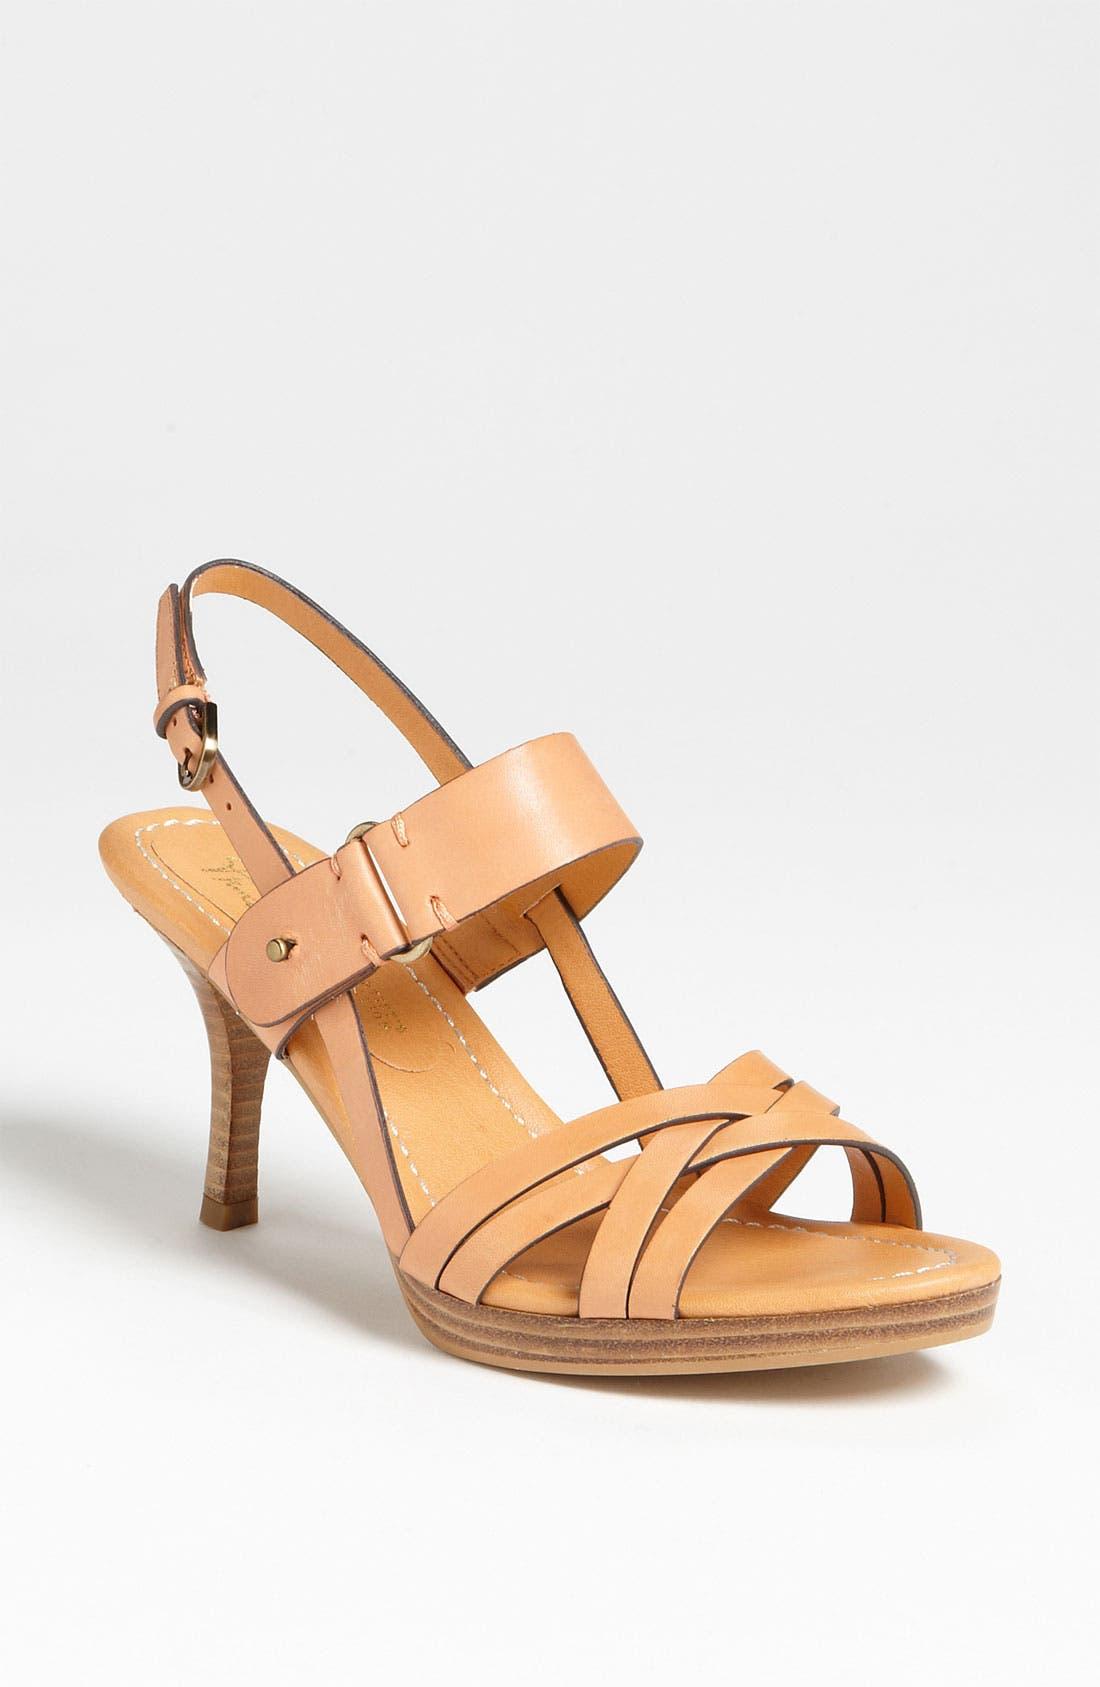 Main Image - Franco Sarto 'Ambra' Sandal